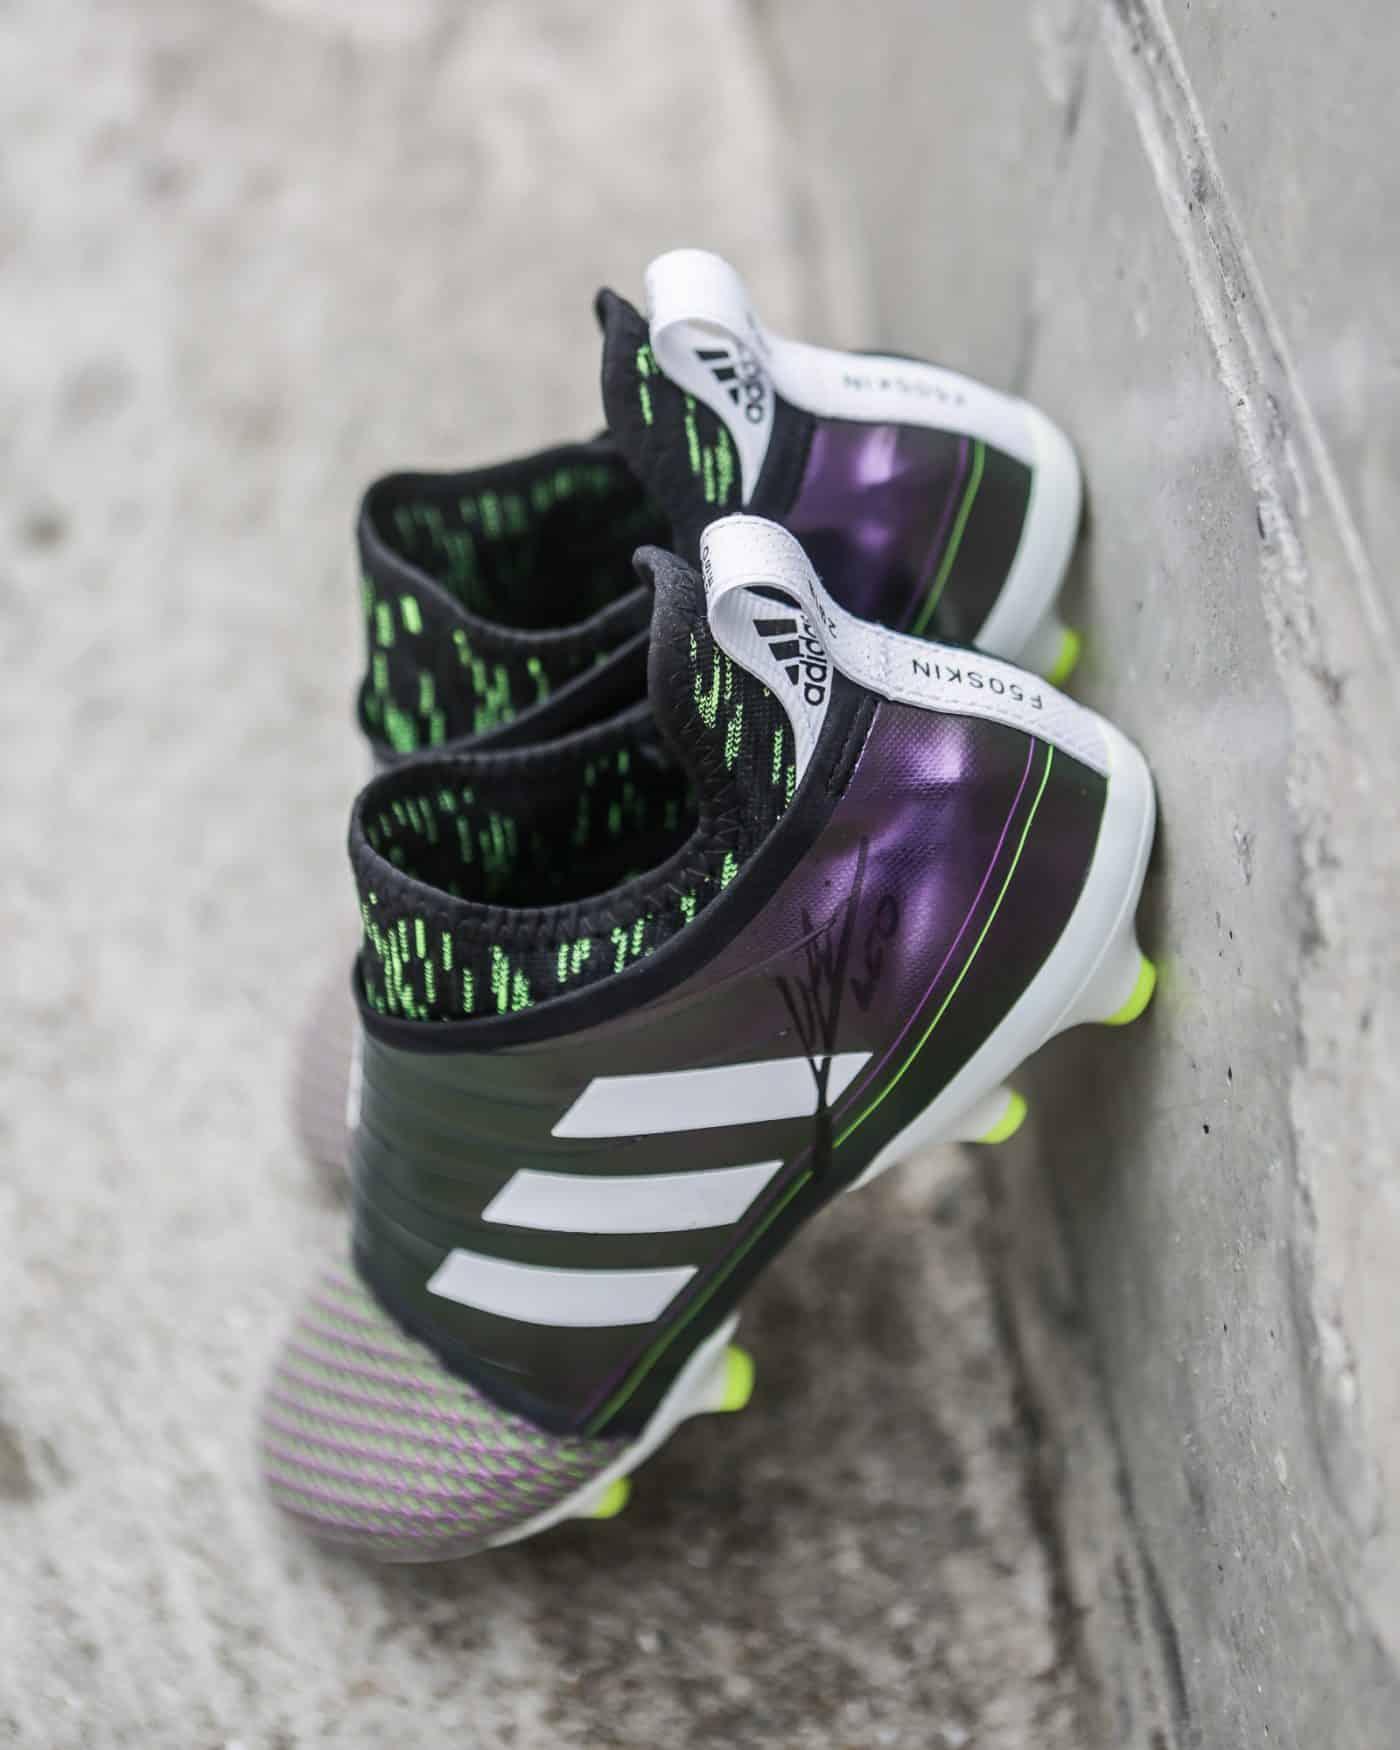 adidas-glitch-skin-F50-lionel-messi-footpack-5